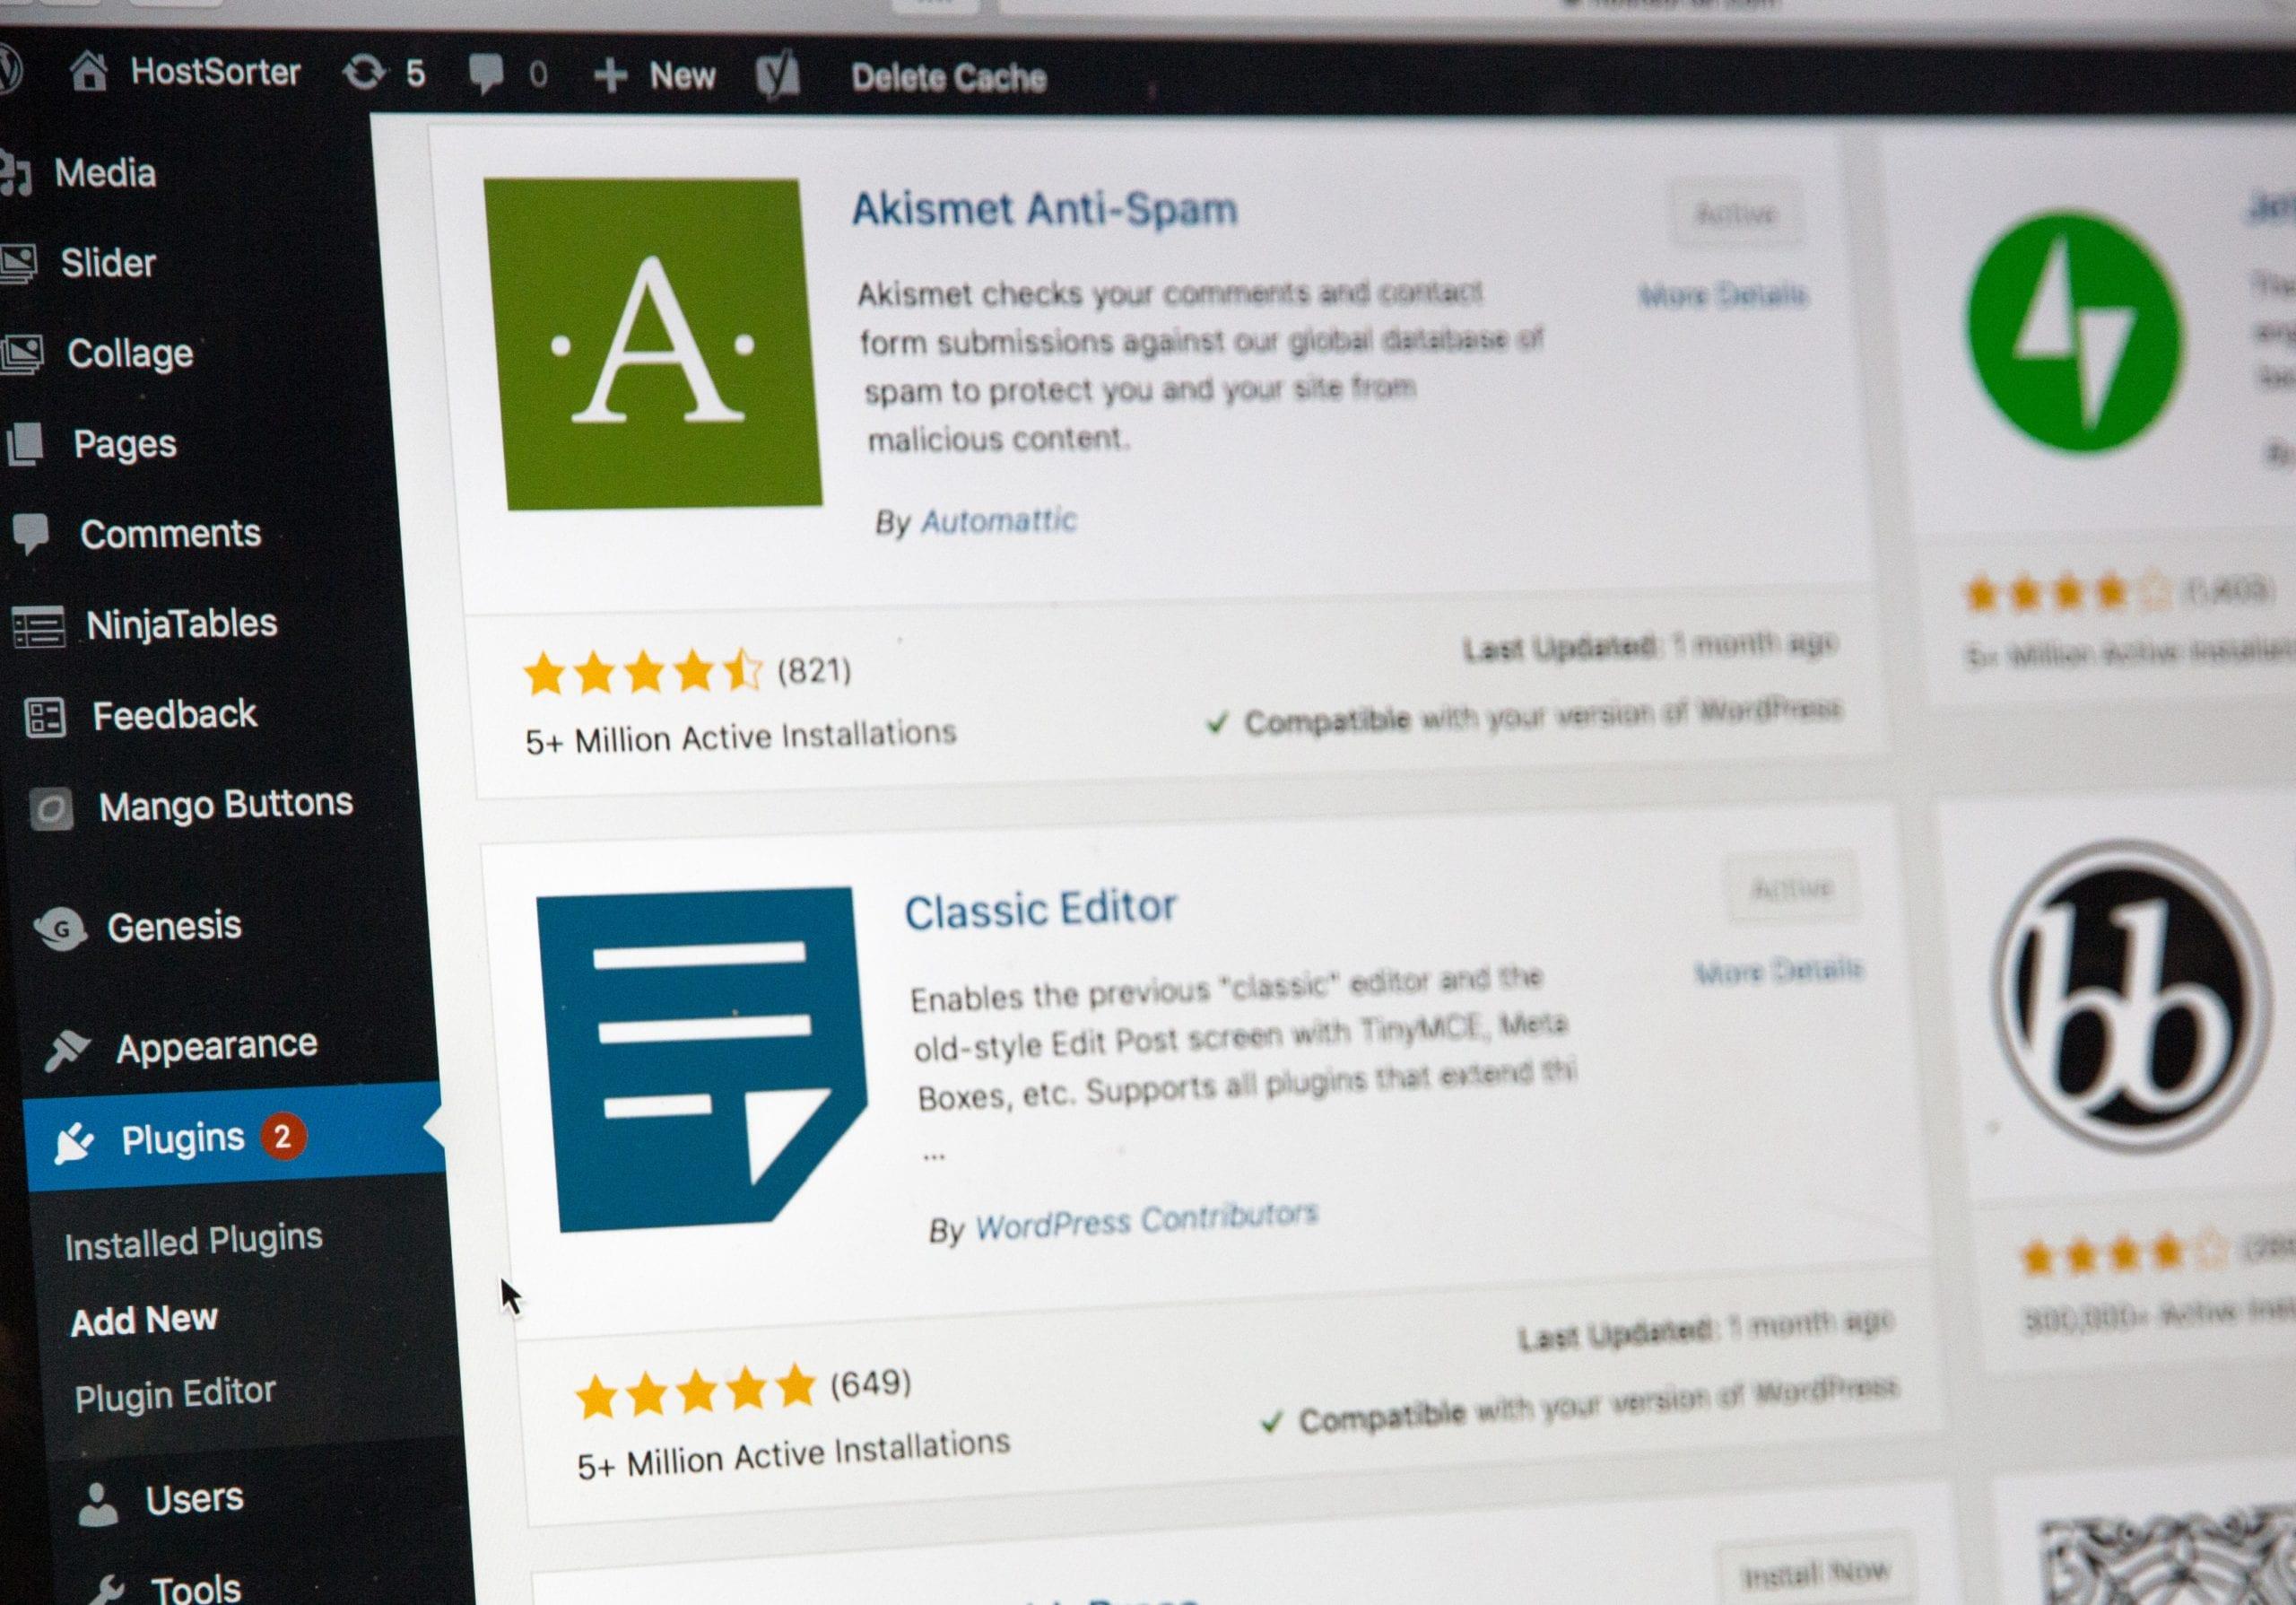 Install plugins through the WordPress admin.